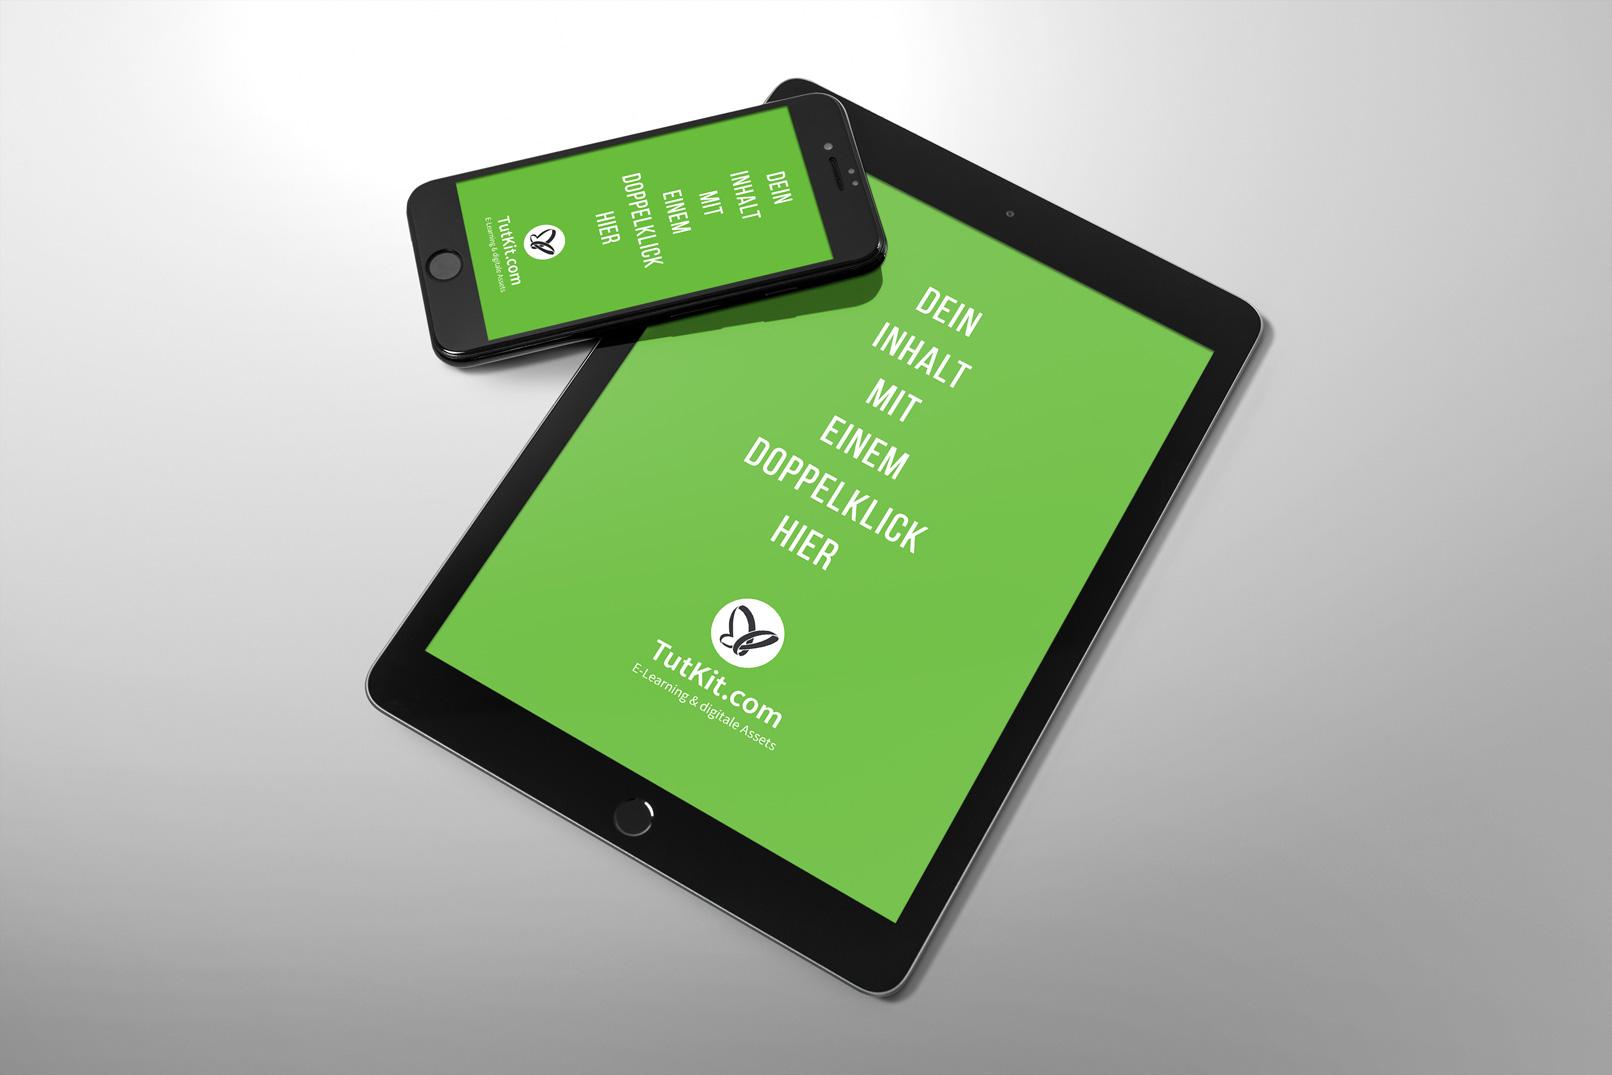 Mockup für Smartphone, Handy und Tablet, iPhone 7, iPad